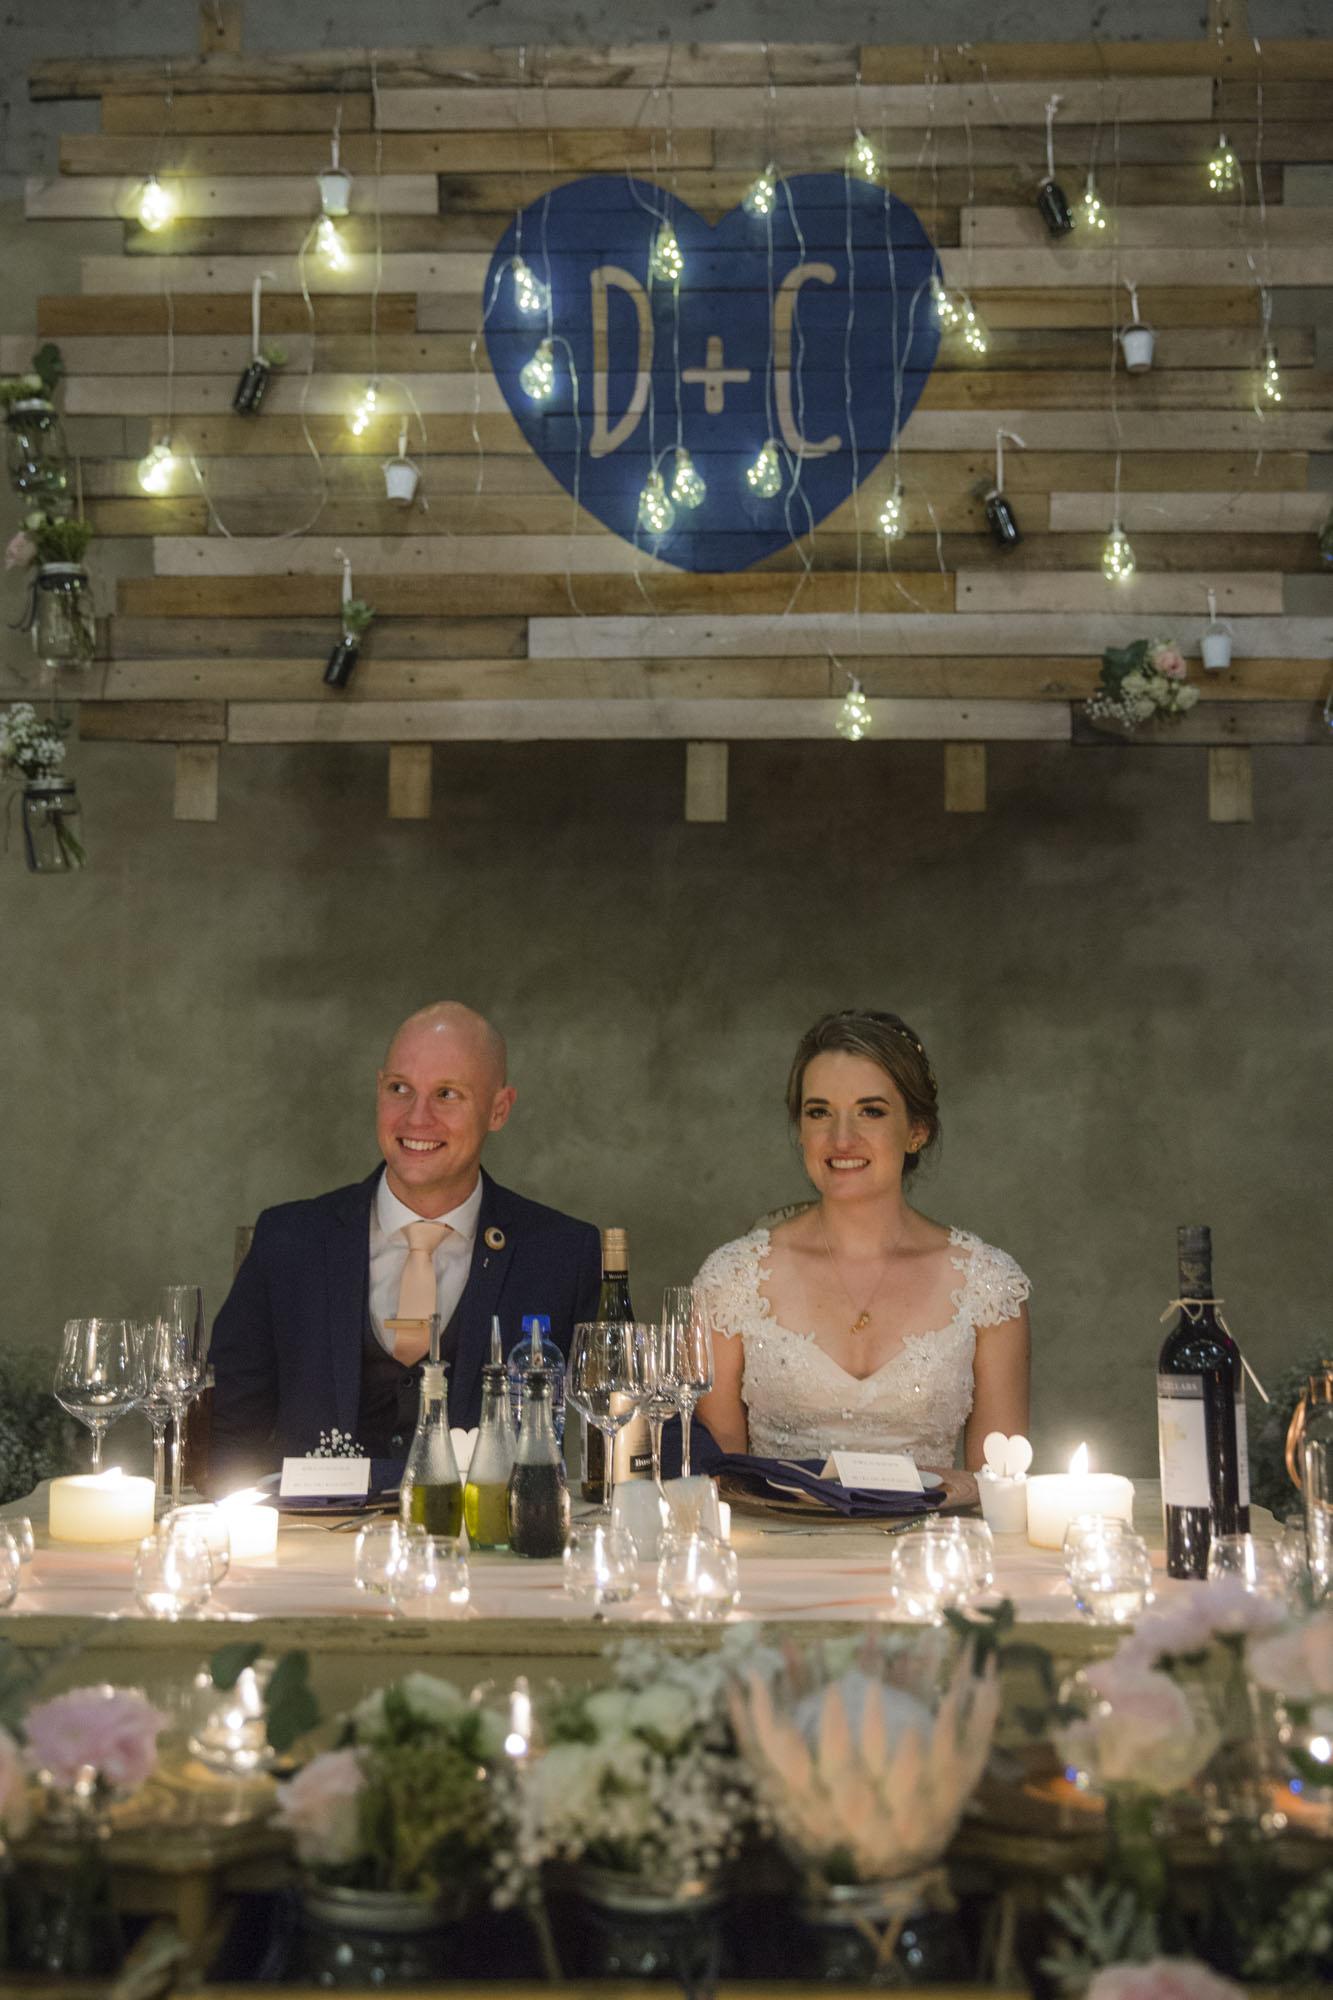 124-photojournalistic-wedding-photographers-johannesburg124-photojournalistic-wedding-photographers-johannesburg_a.jpg